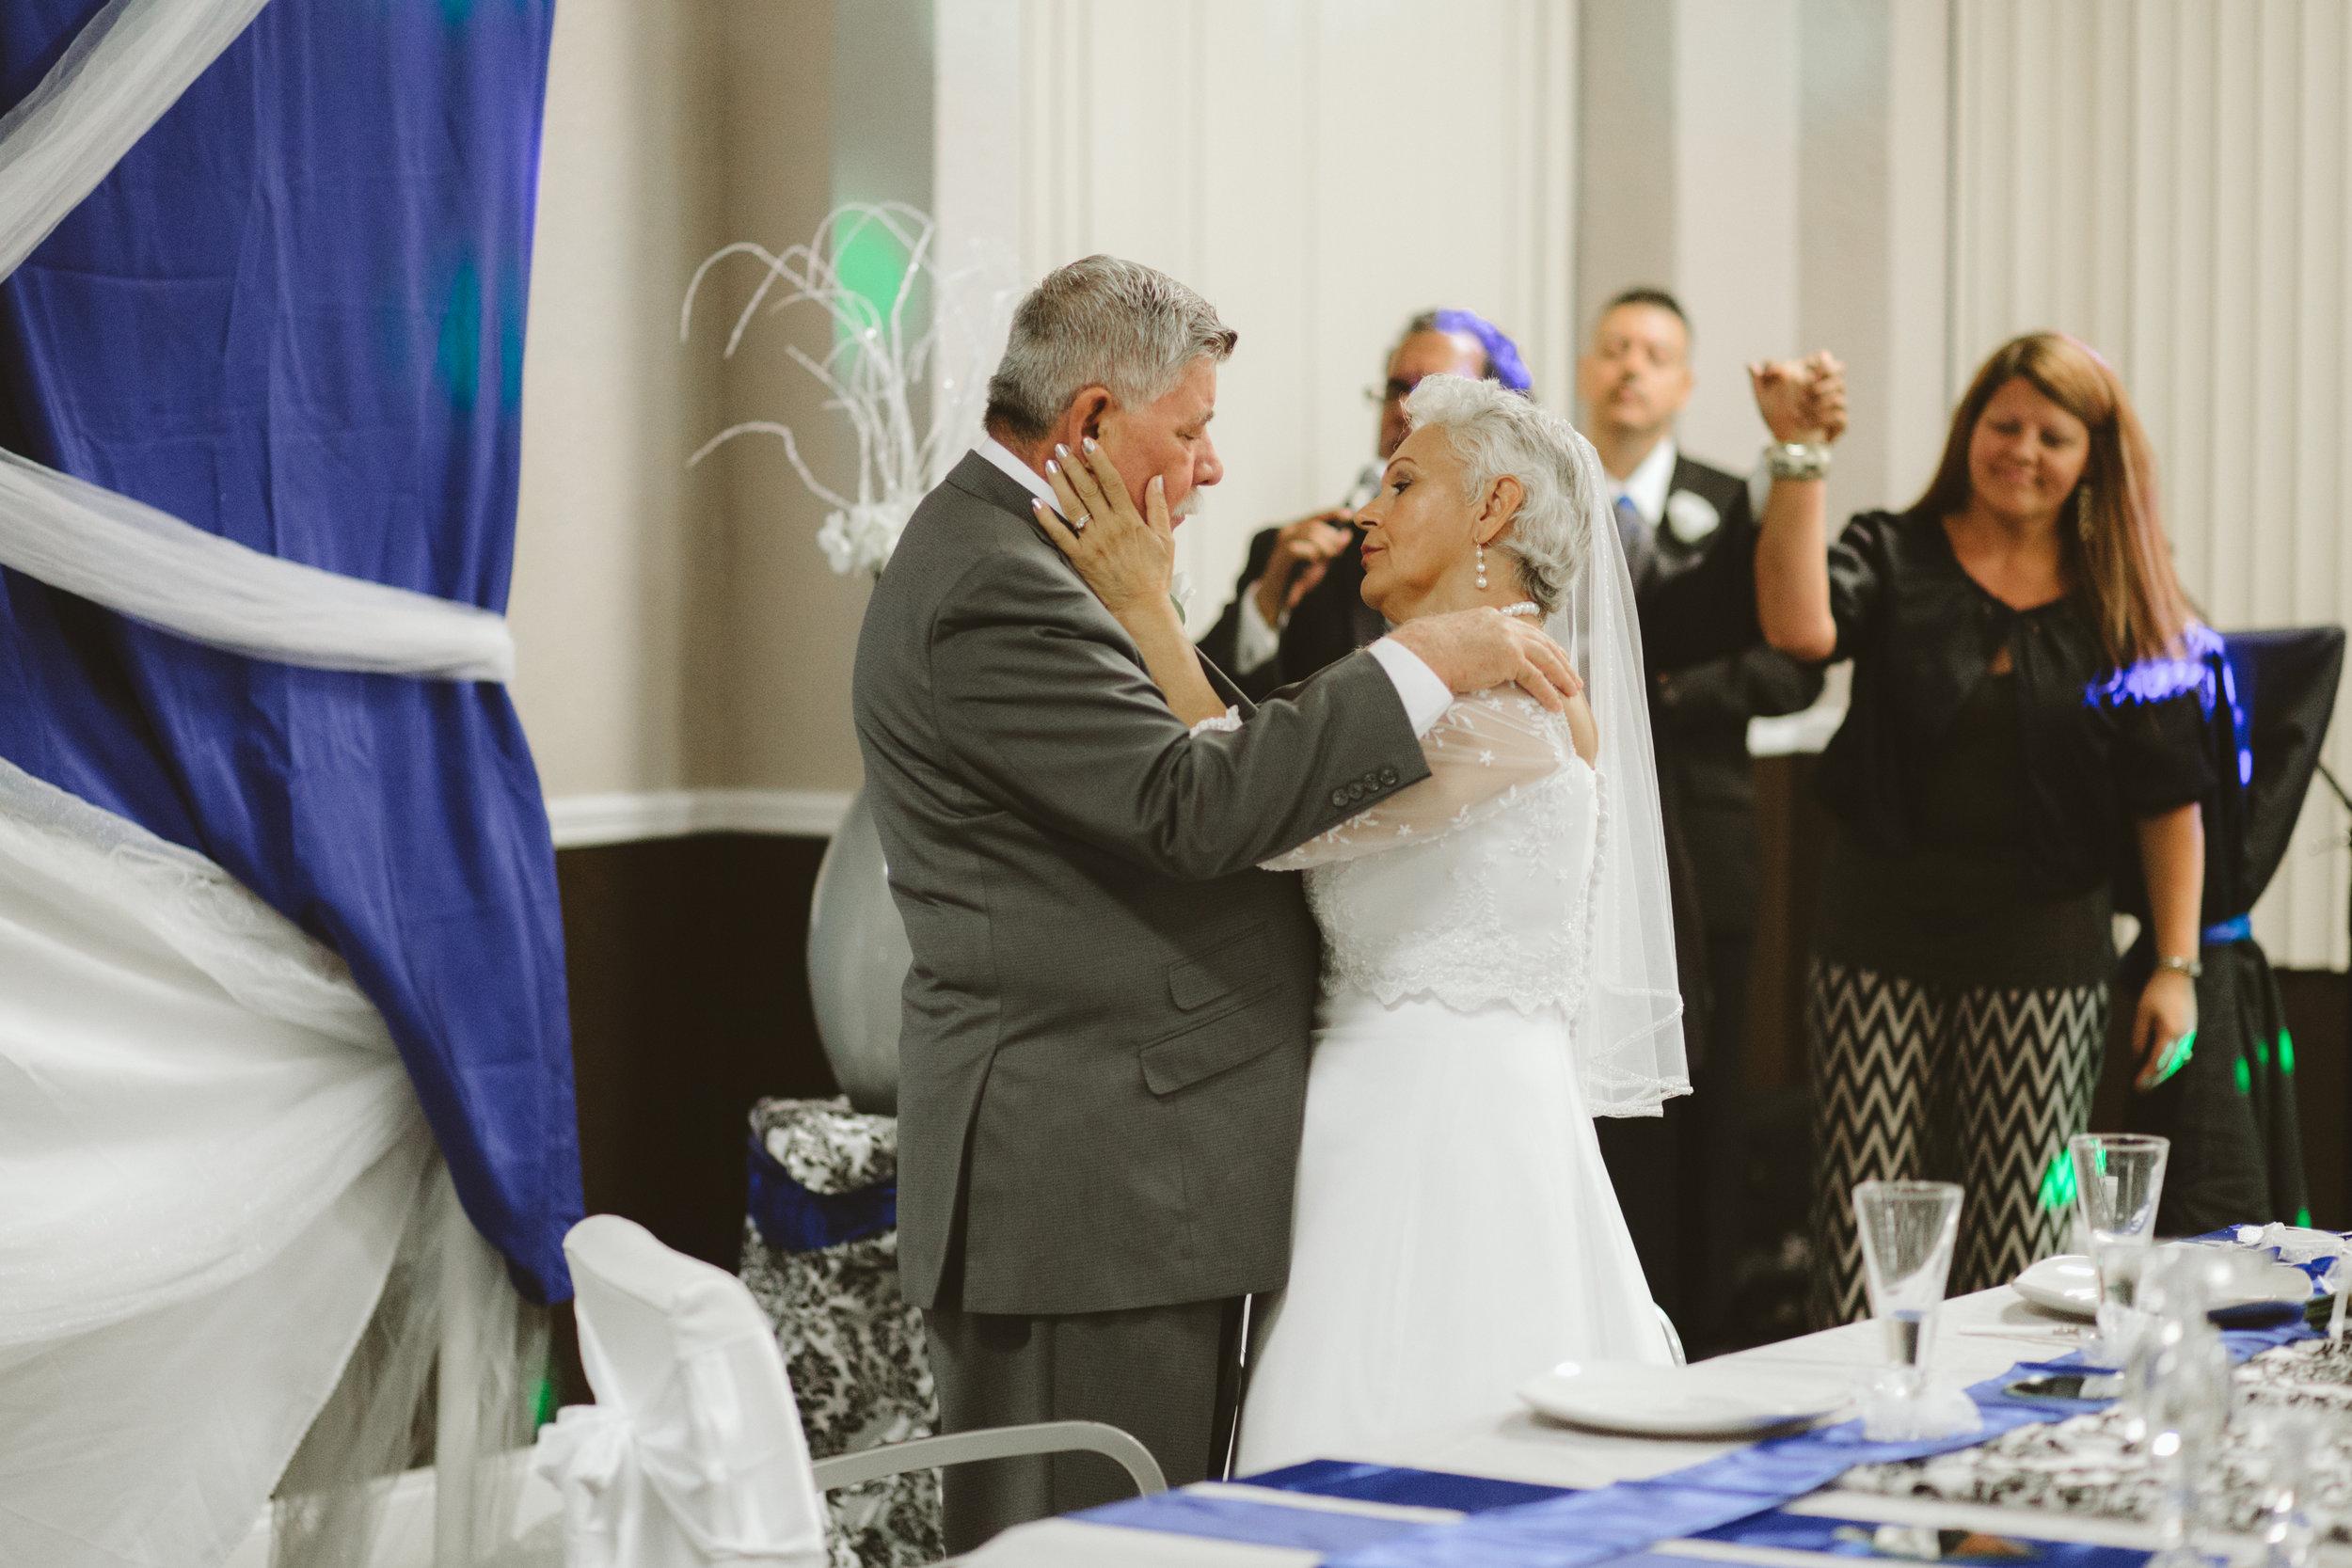 wedding | Vanessa Boy Photography | vanessaboy.com |-317.jpg